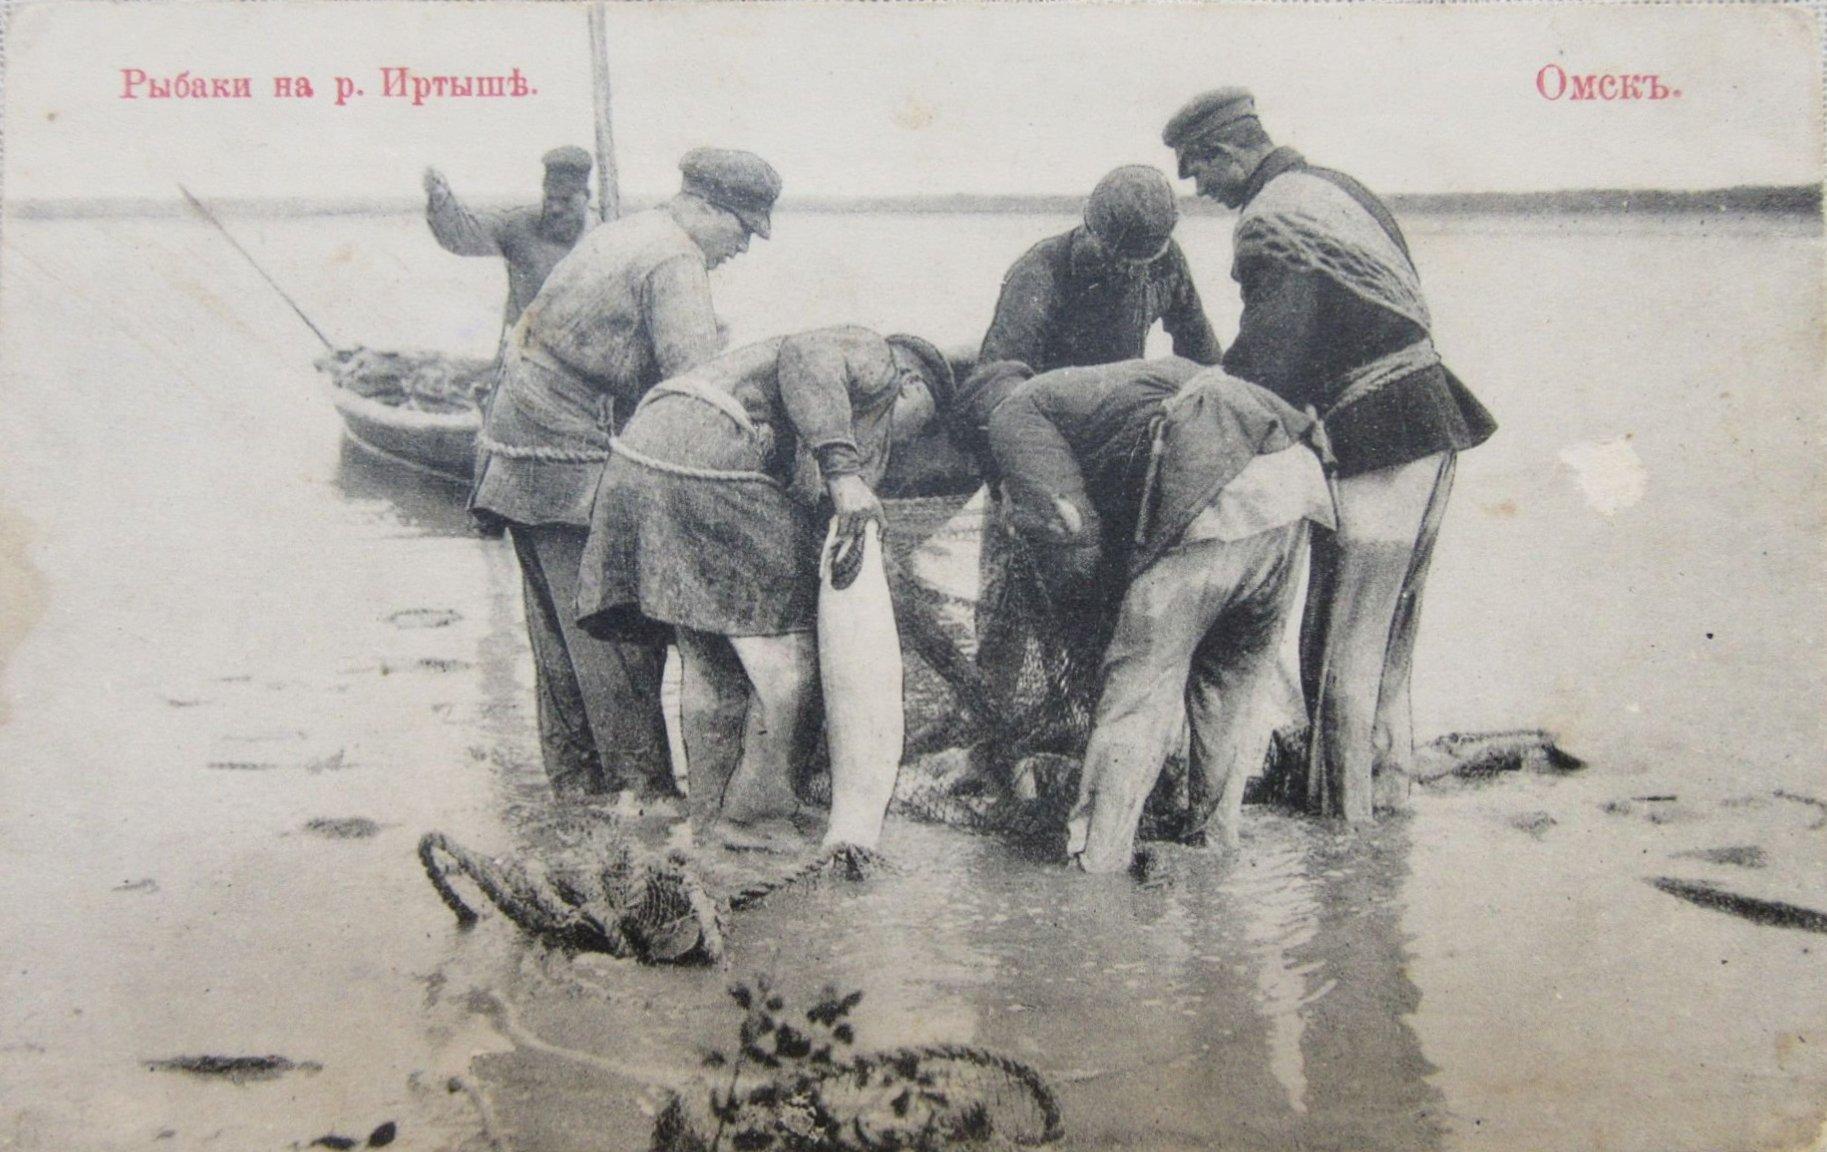 Рыбаки на р. Иртыше.